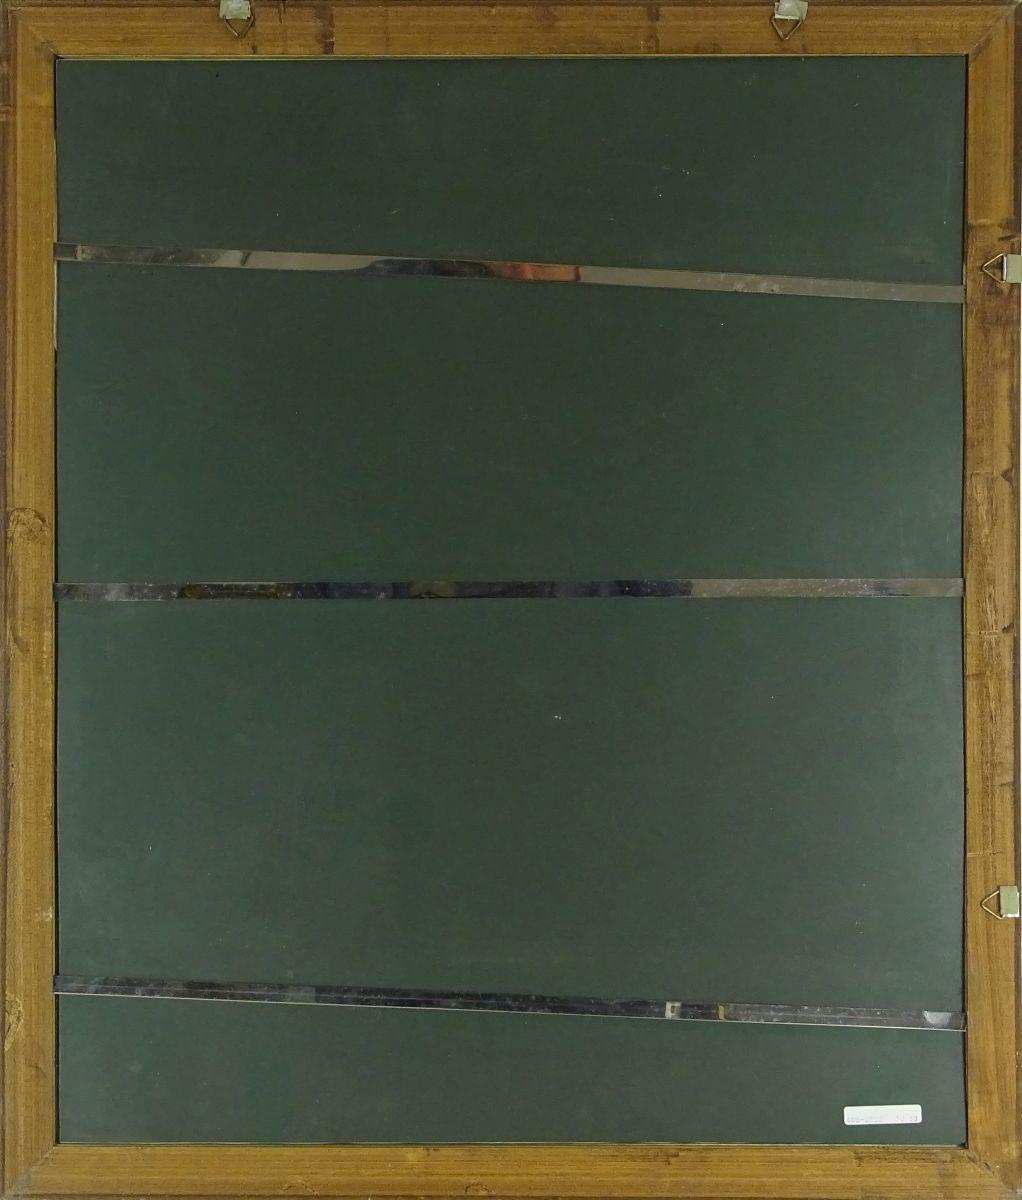 DSC03034.JPG (1022×1200)